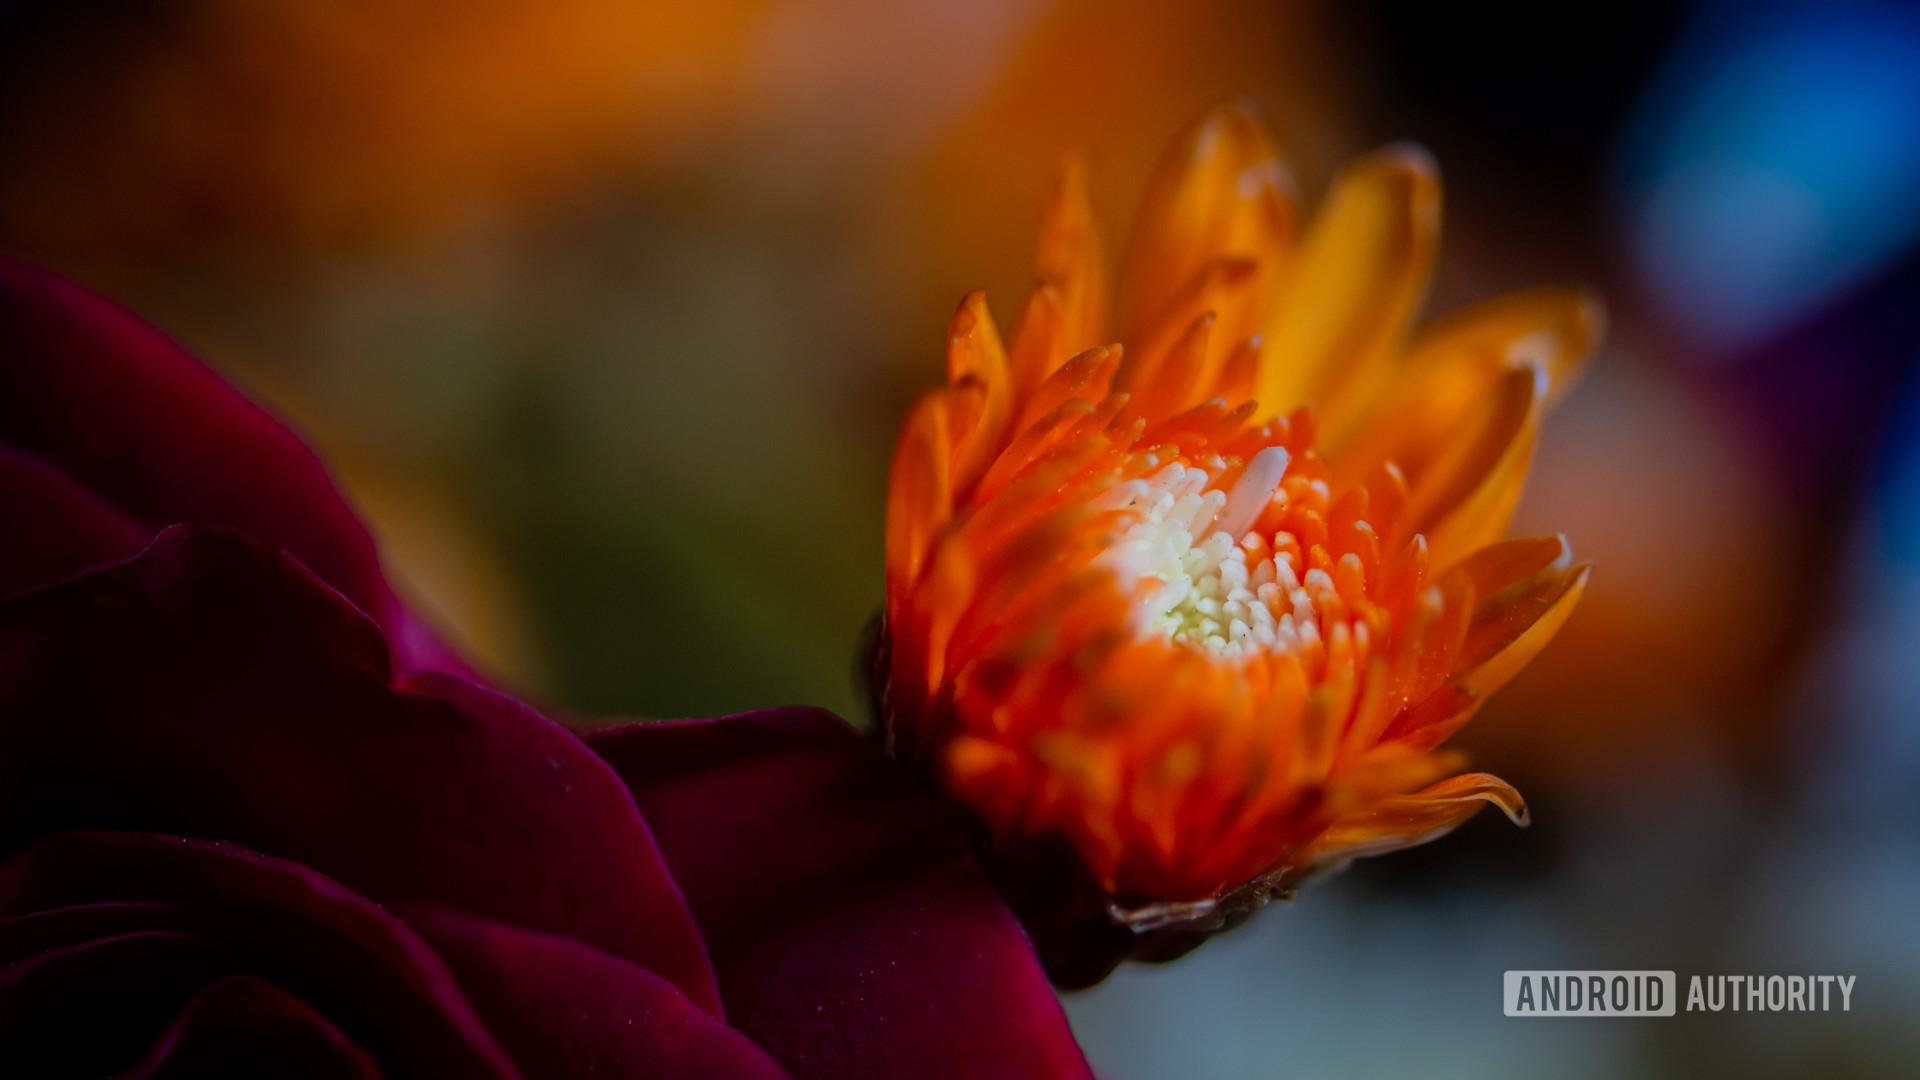 Macro photo - focal length and bokeh